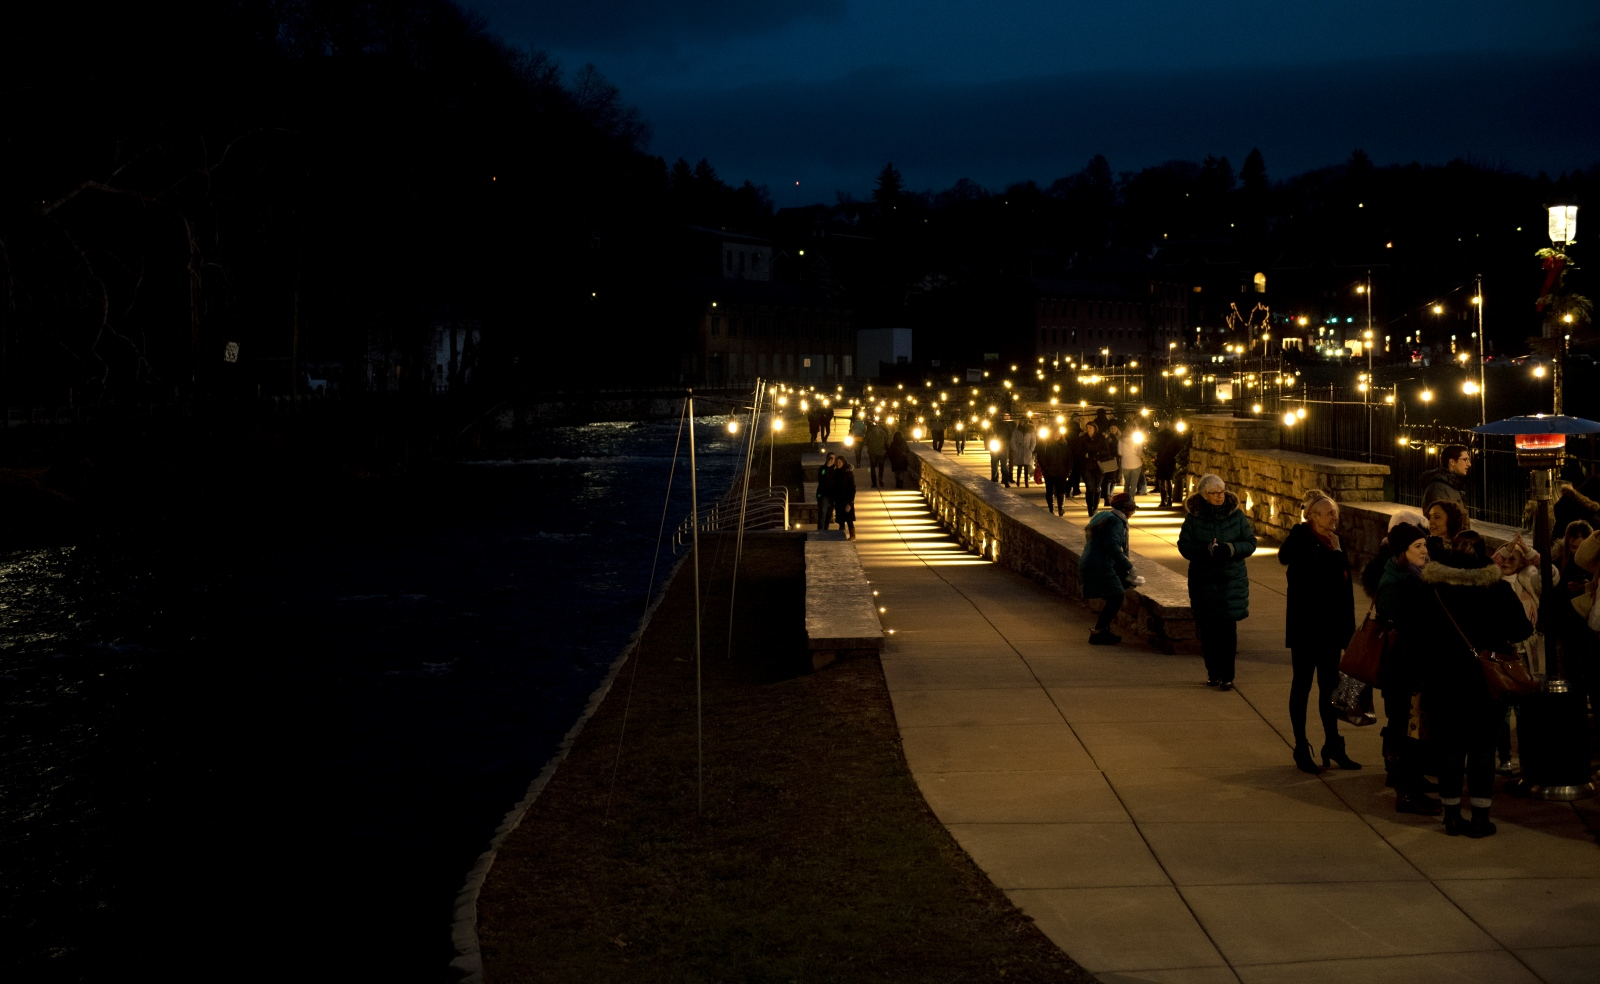 The Bellefonte Lights Winter Market is held along the waterfront walk and the Lamb Street bridge Saturday, Dec. 8, 2018, in Bellefonte, Pa.